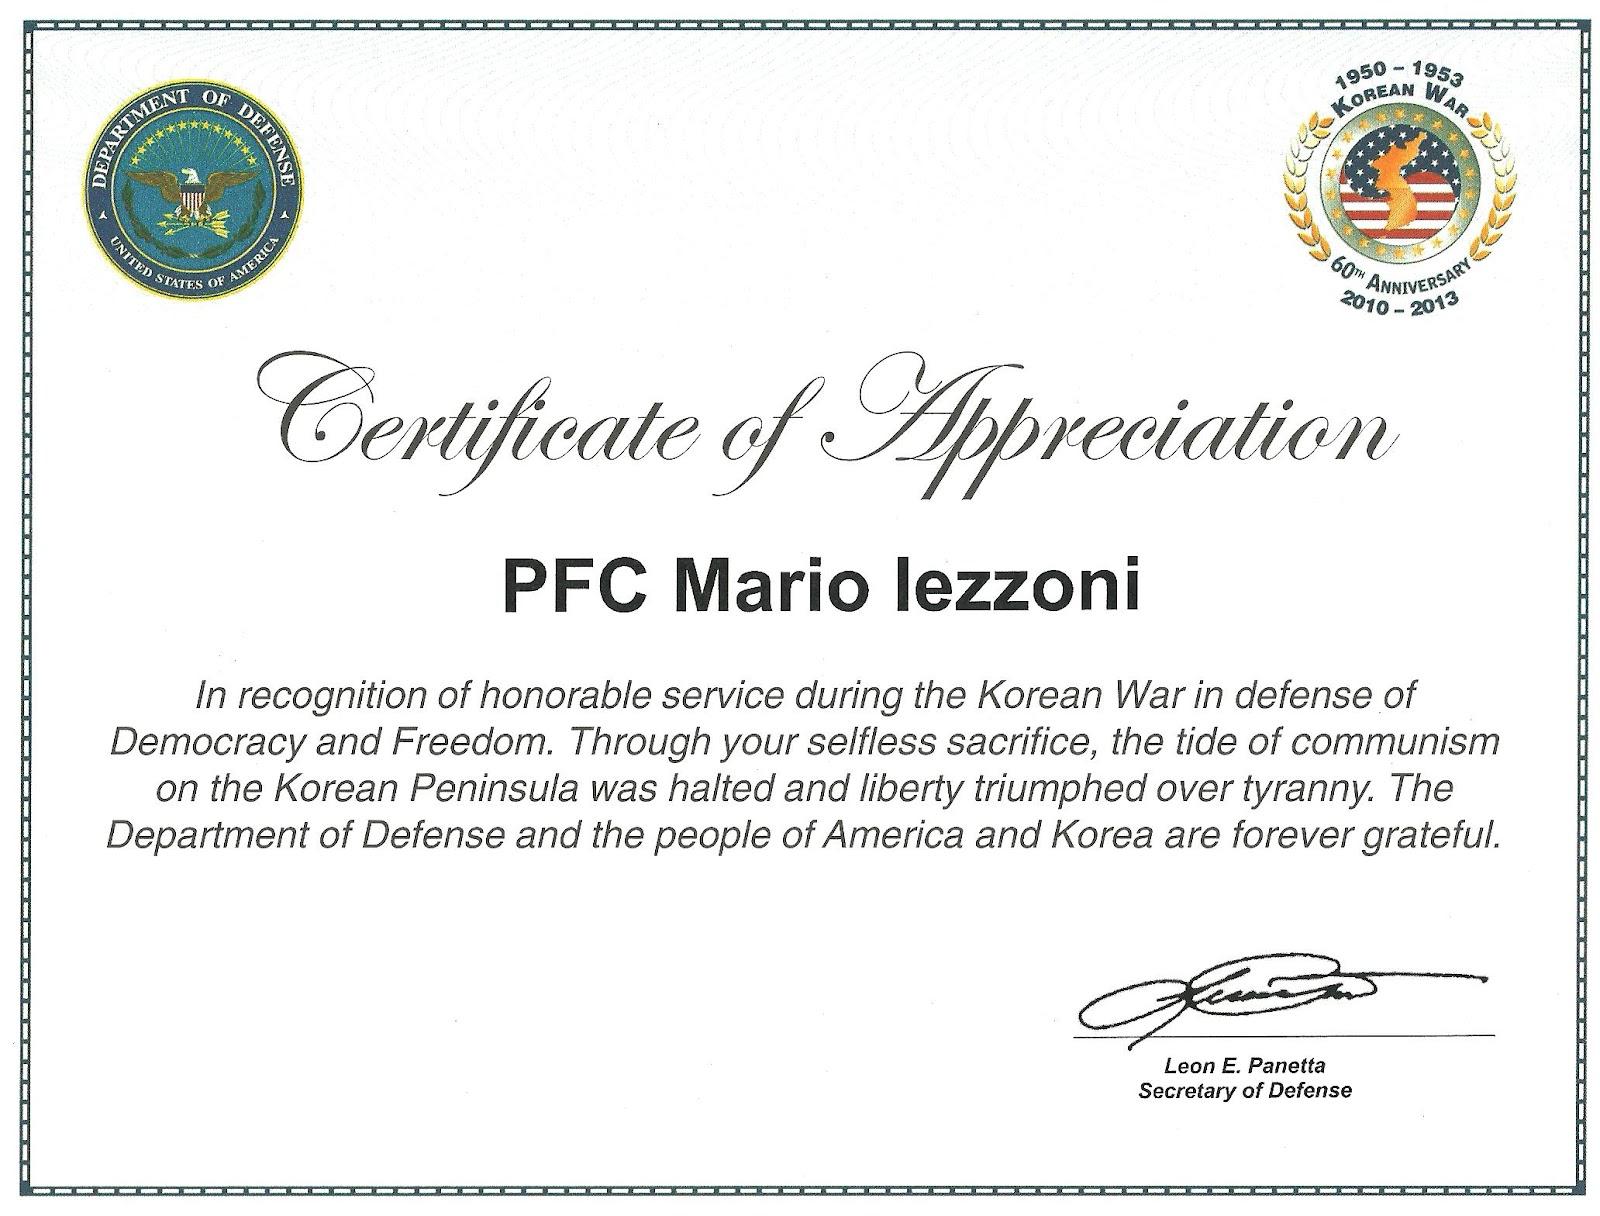 Military Certificate Of Appreciation Template Pictures to Pin on – Army Certificate of Appreciation Template